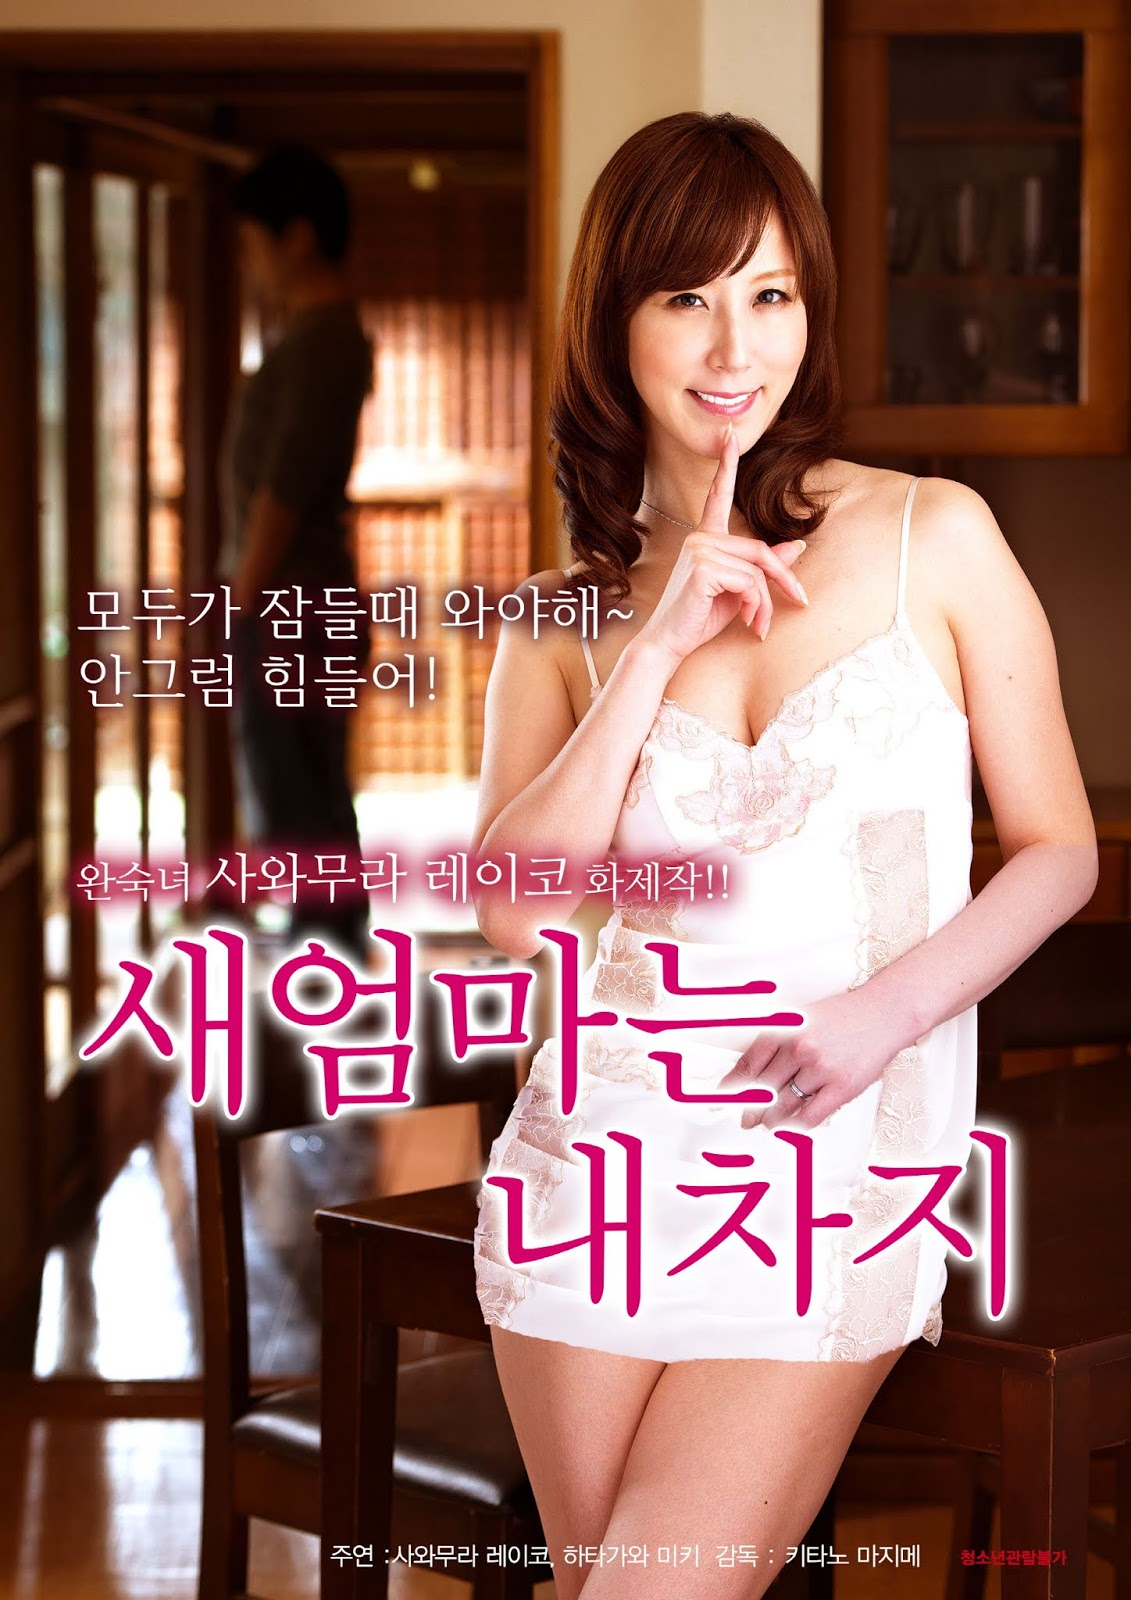 Kinshin Mugon Sokan Sawamura Reiko Full Korea 18+ Adult Movie Online Free